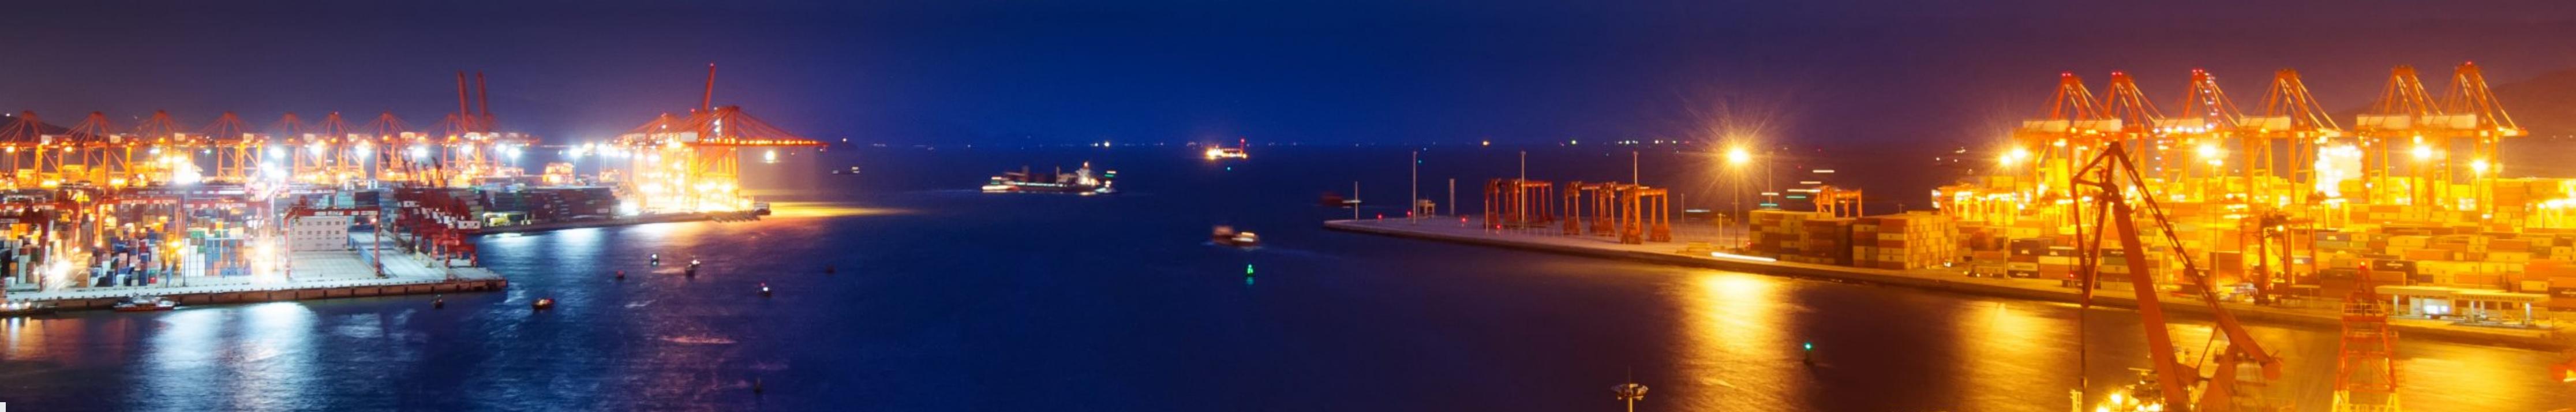 Marine surface repairs geraldton